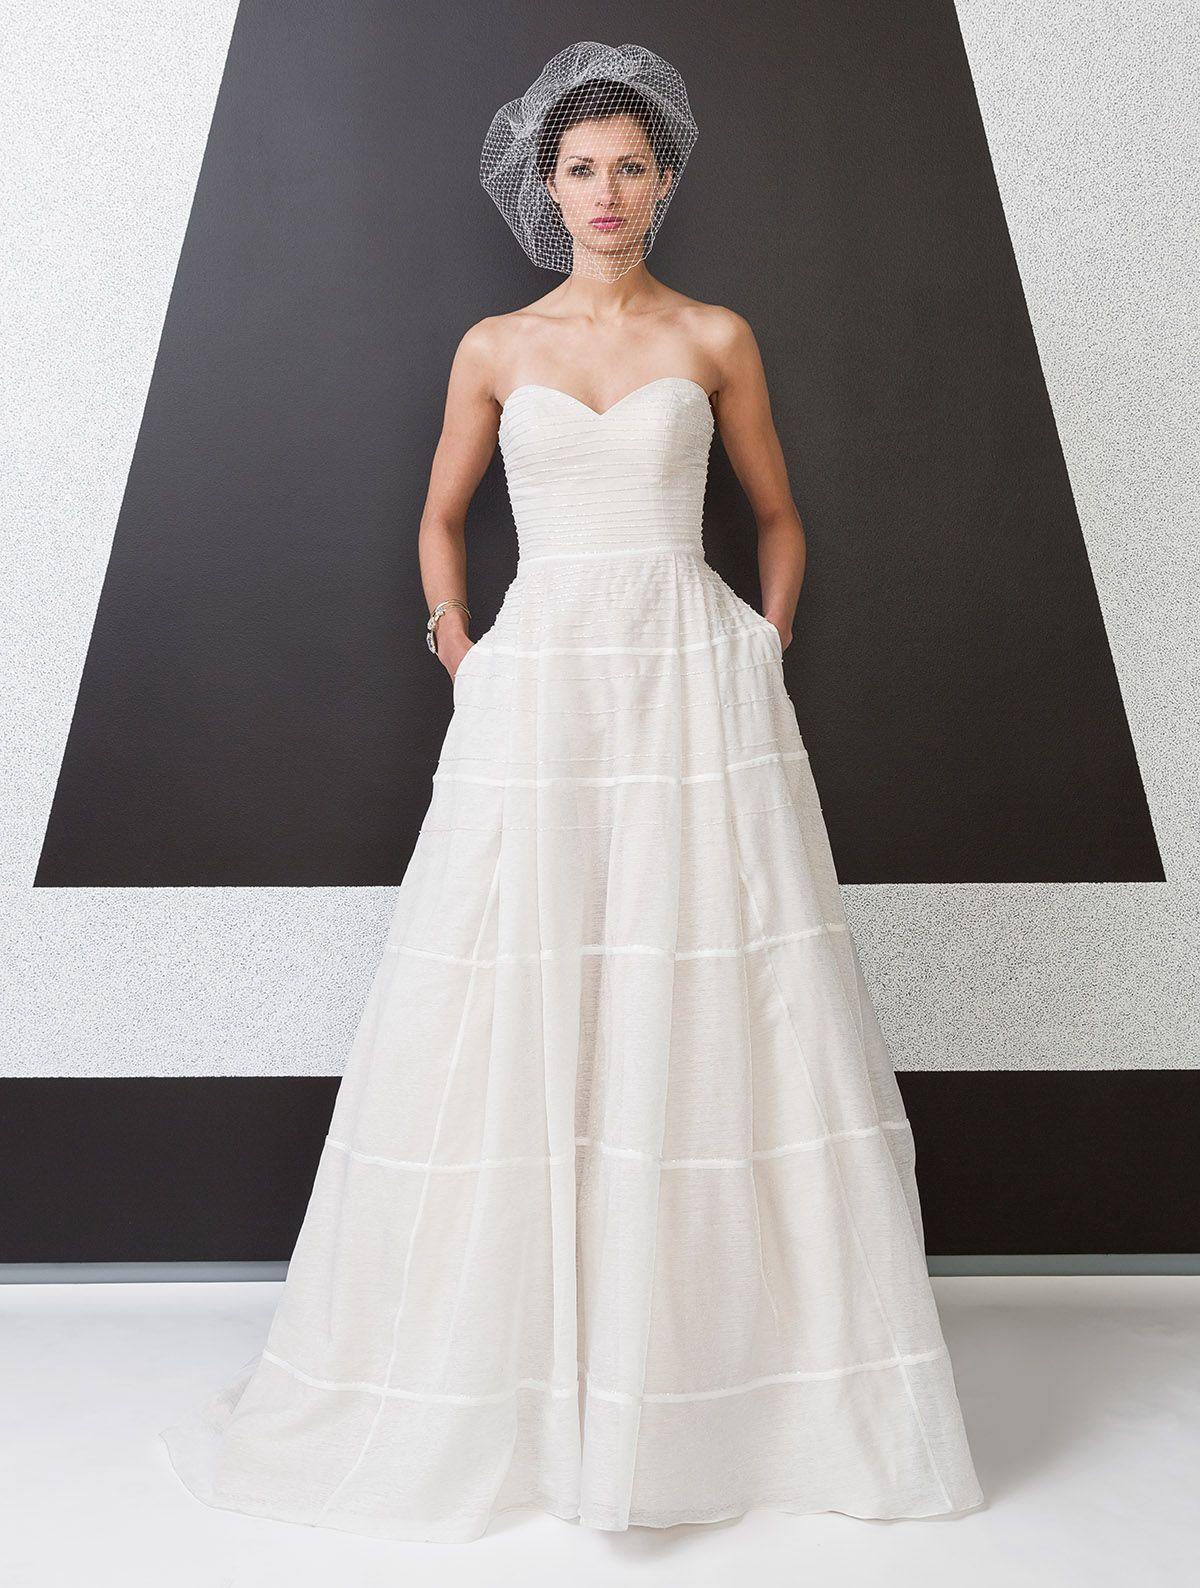 Modern Masterpieces 8 Artistic Architectural Wedding Gowns